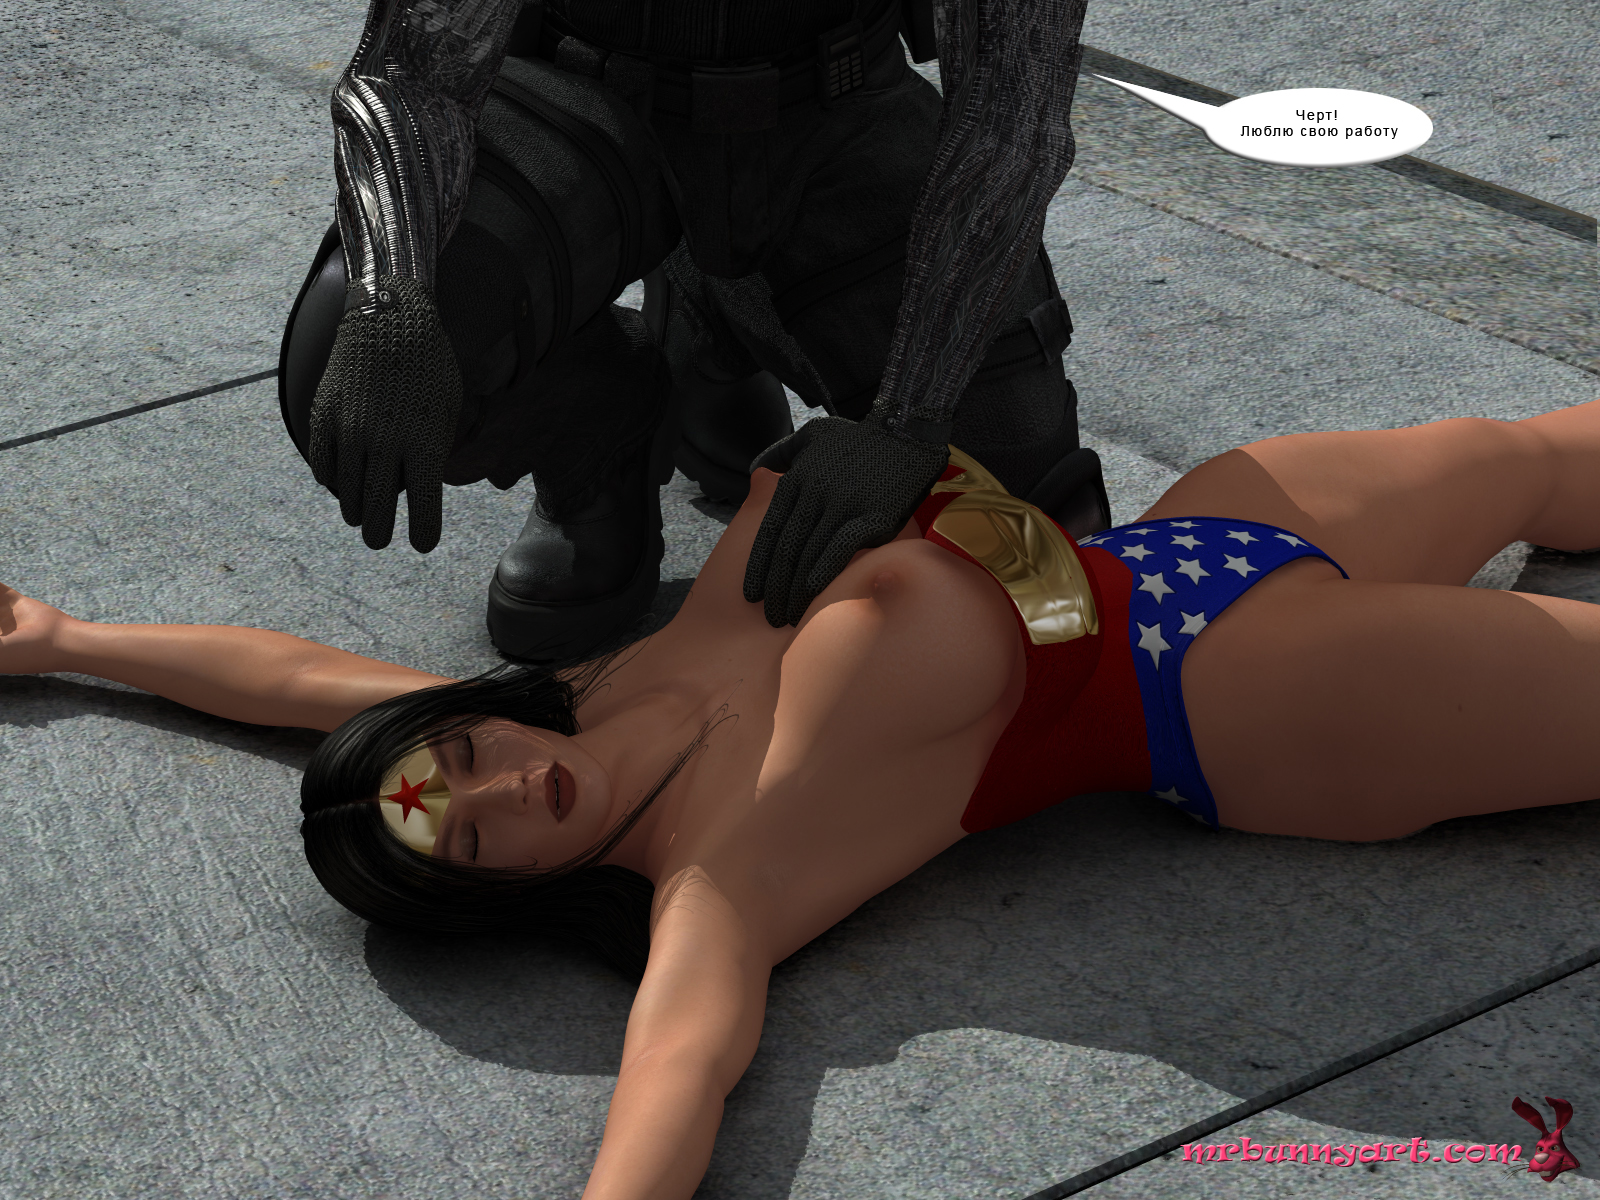 Wonder Woman vs Cain (Russian) - page09 DC Comics,Wonder Woman,  xxx porn rule34